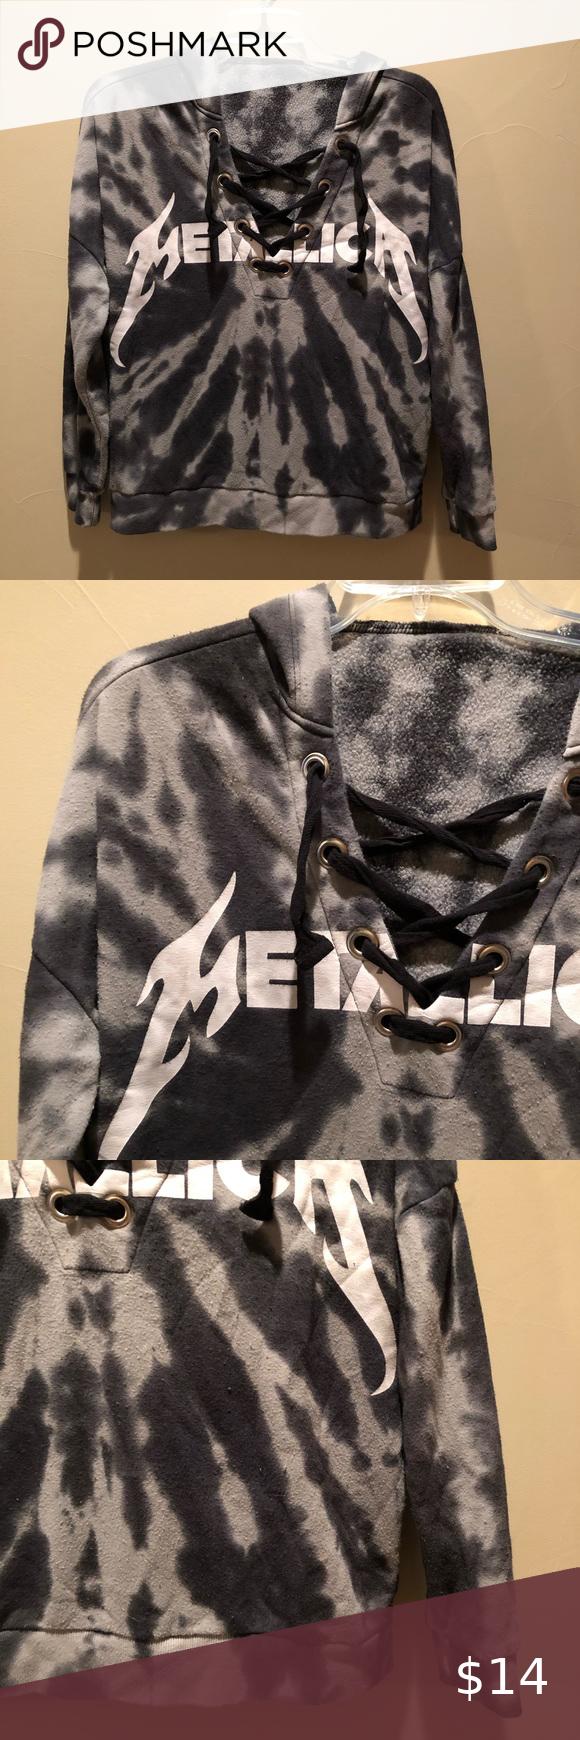 Metallica Tie Dye Lace Up Sweatshirt Sweatshirts Women Sweatshirts Grey Tie Dye [ 1740 x 580 Pixel ]